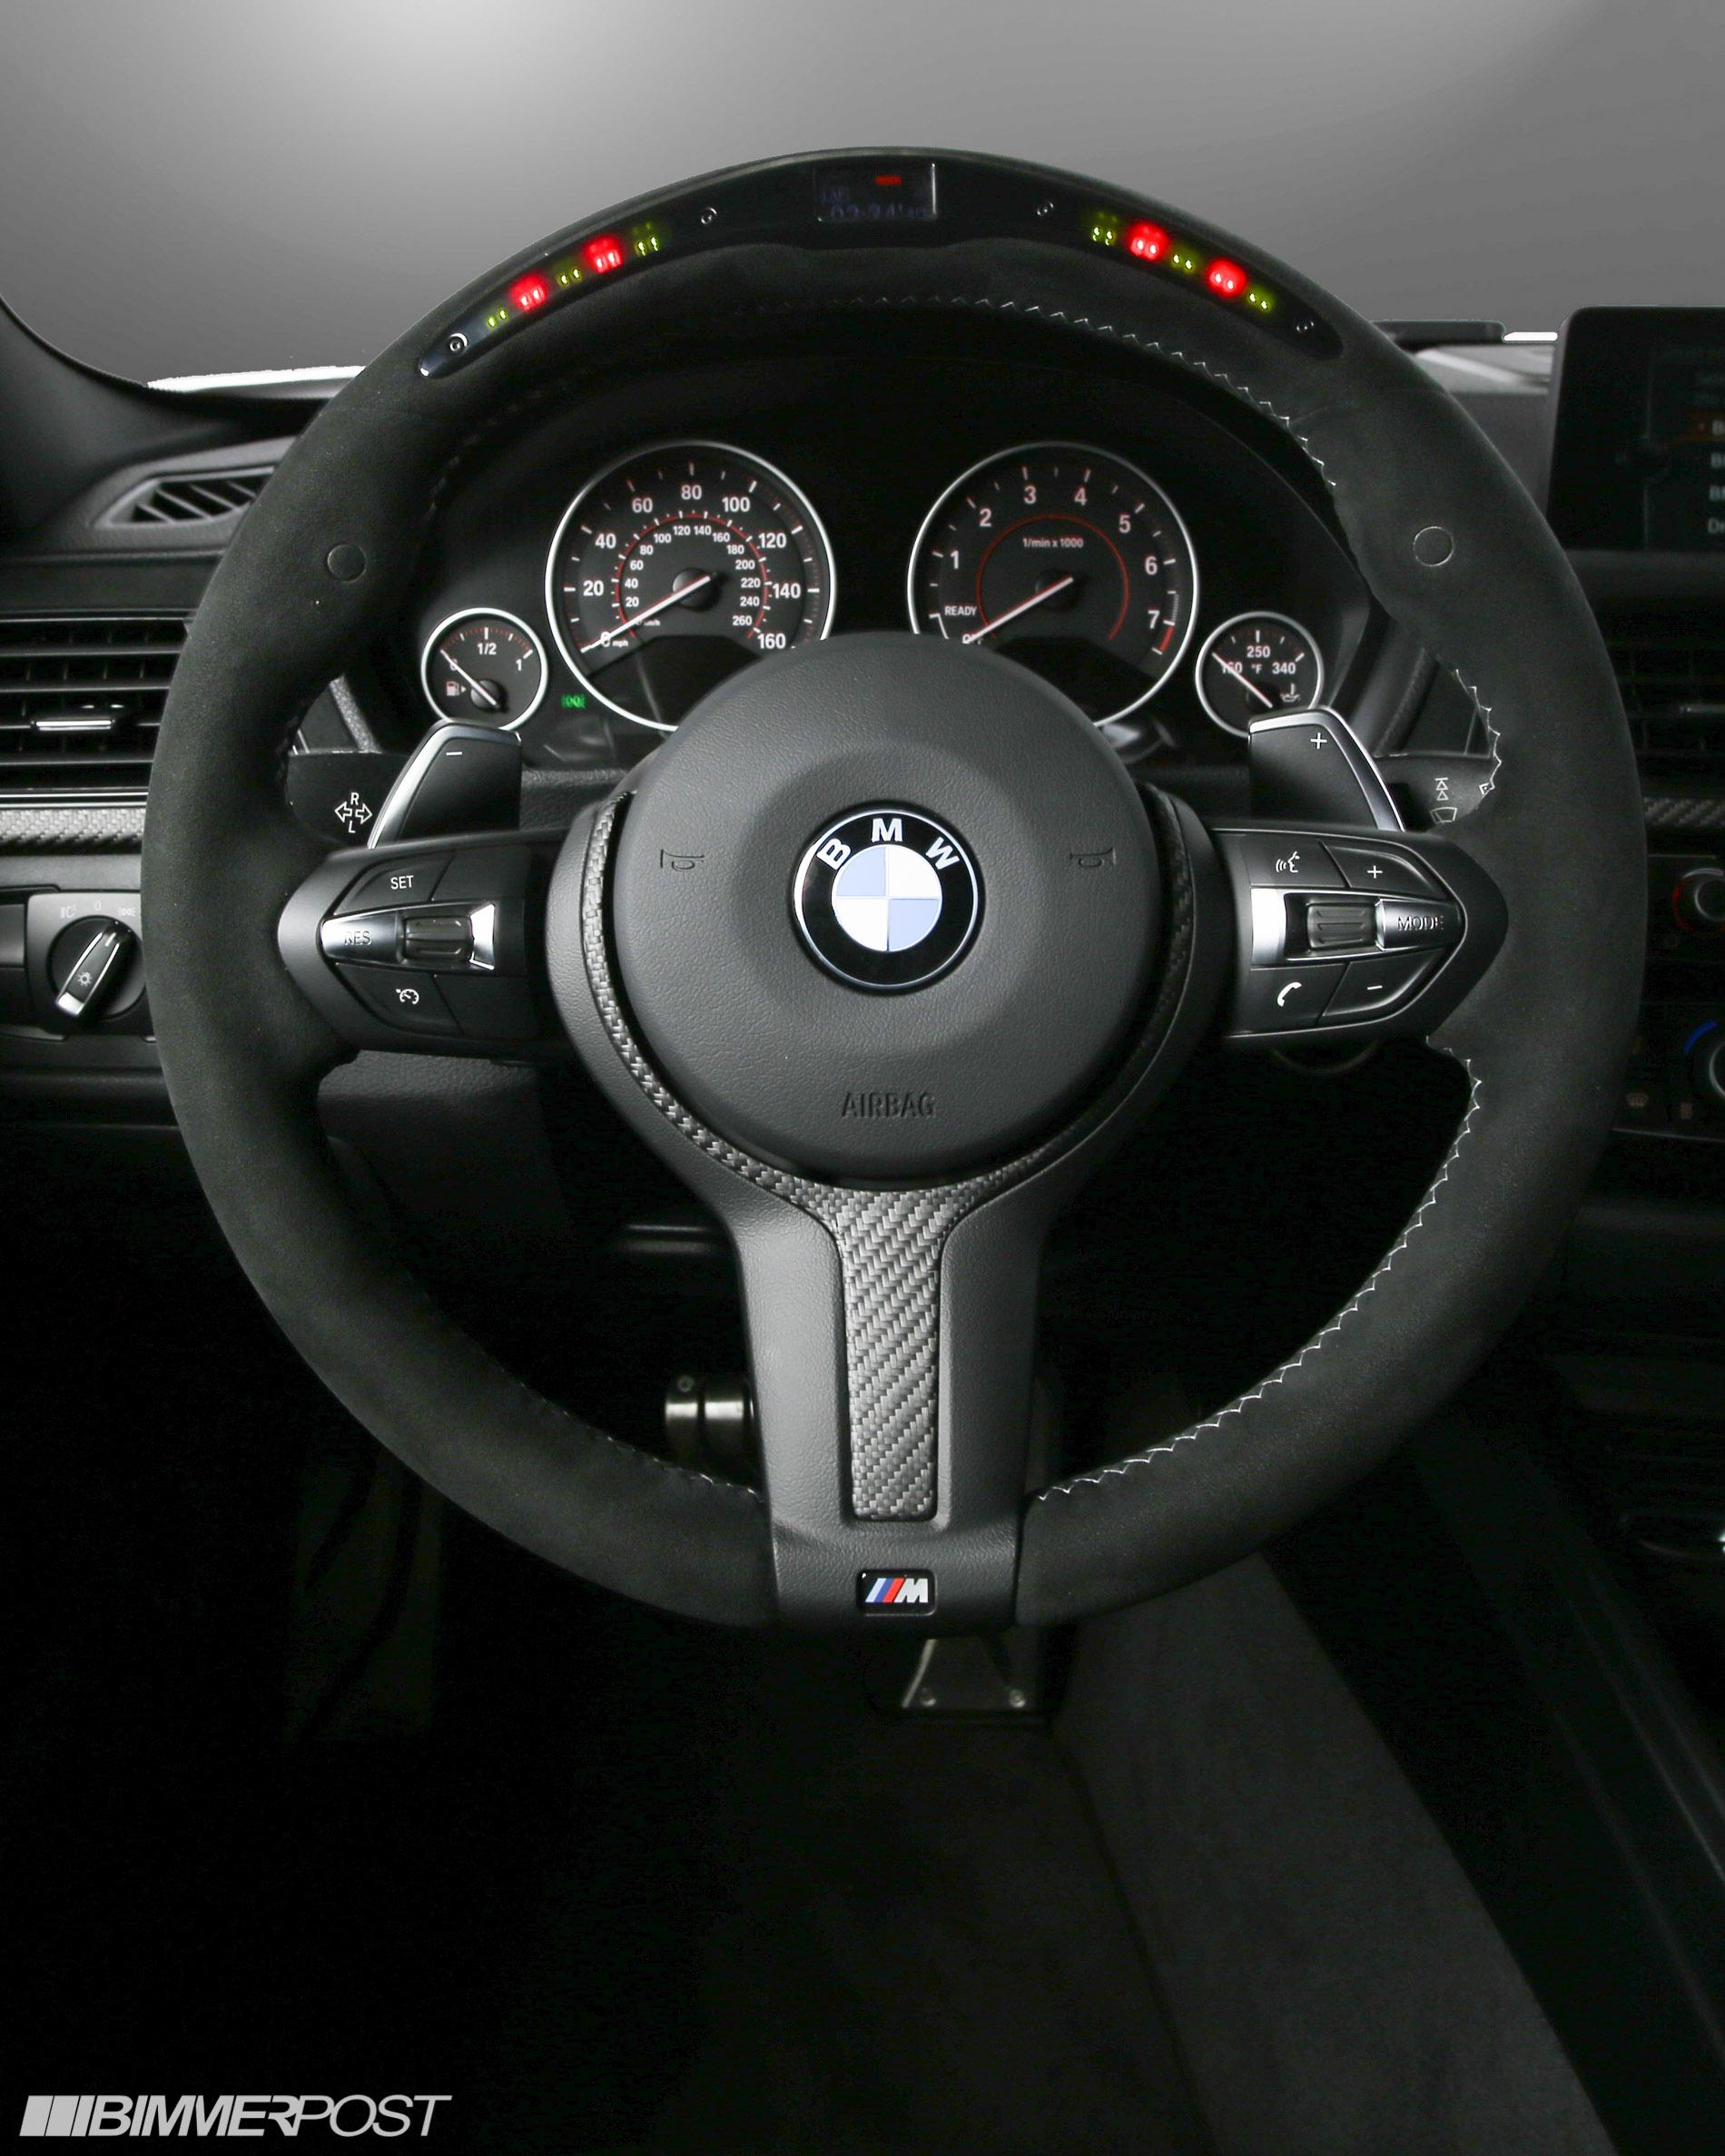 BMW M Performance Parts And Original BMW Accessories